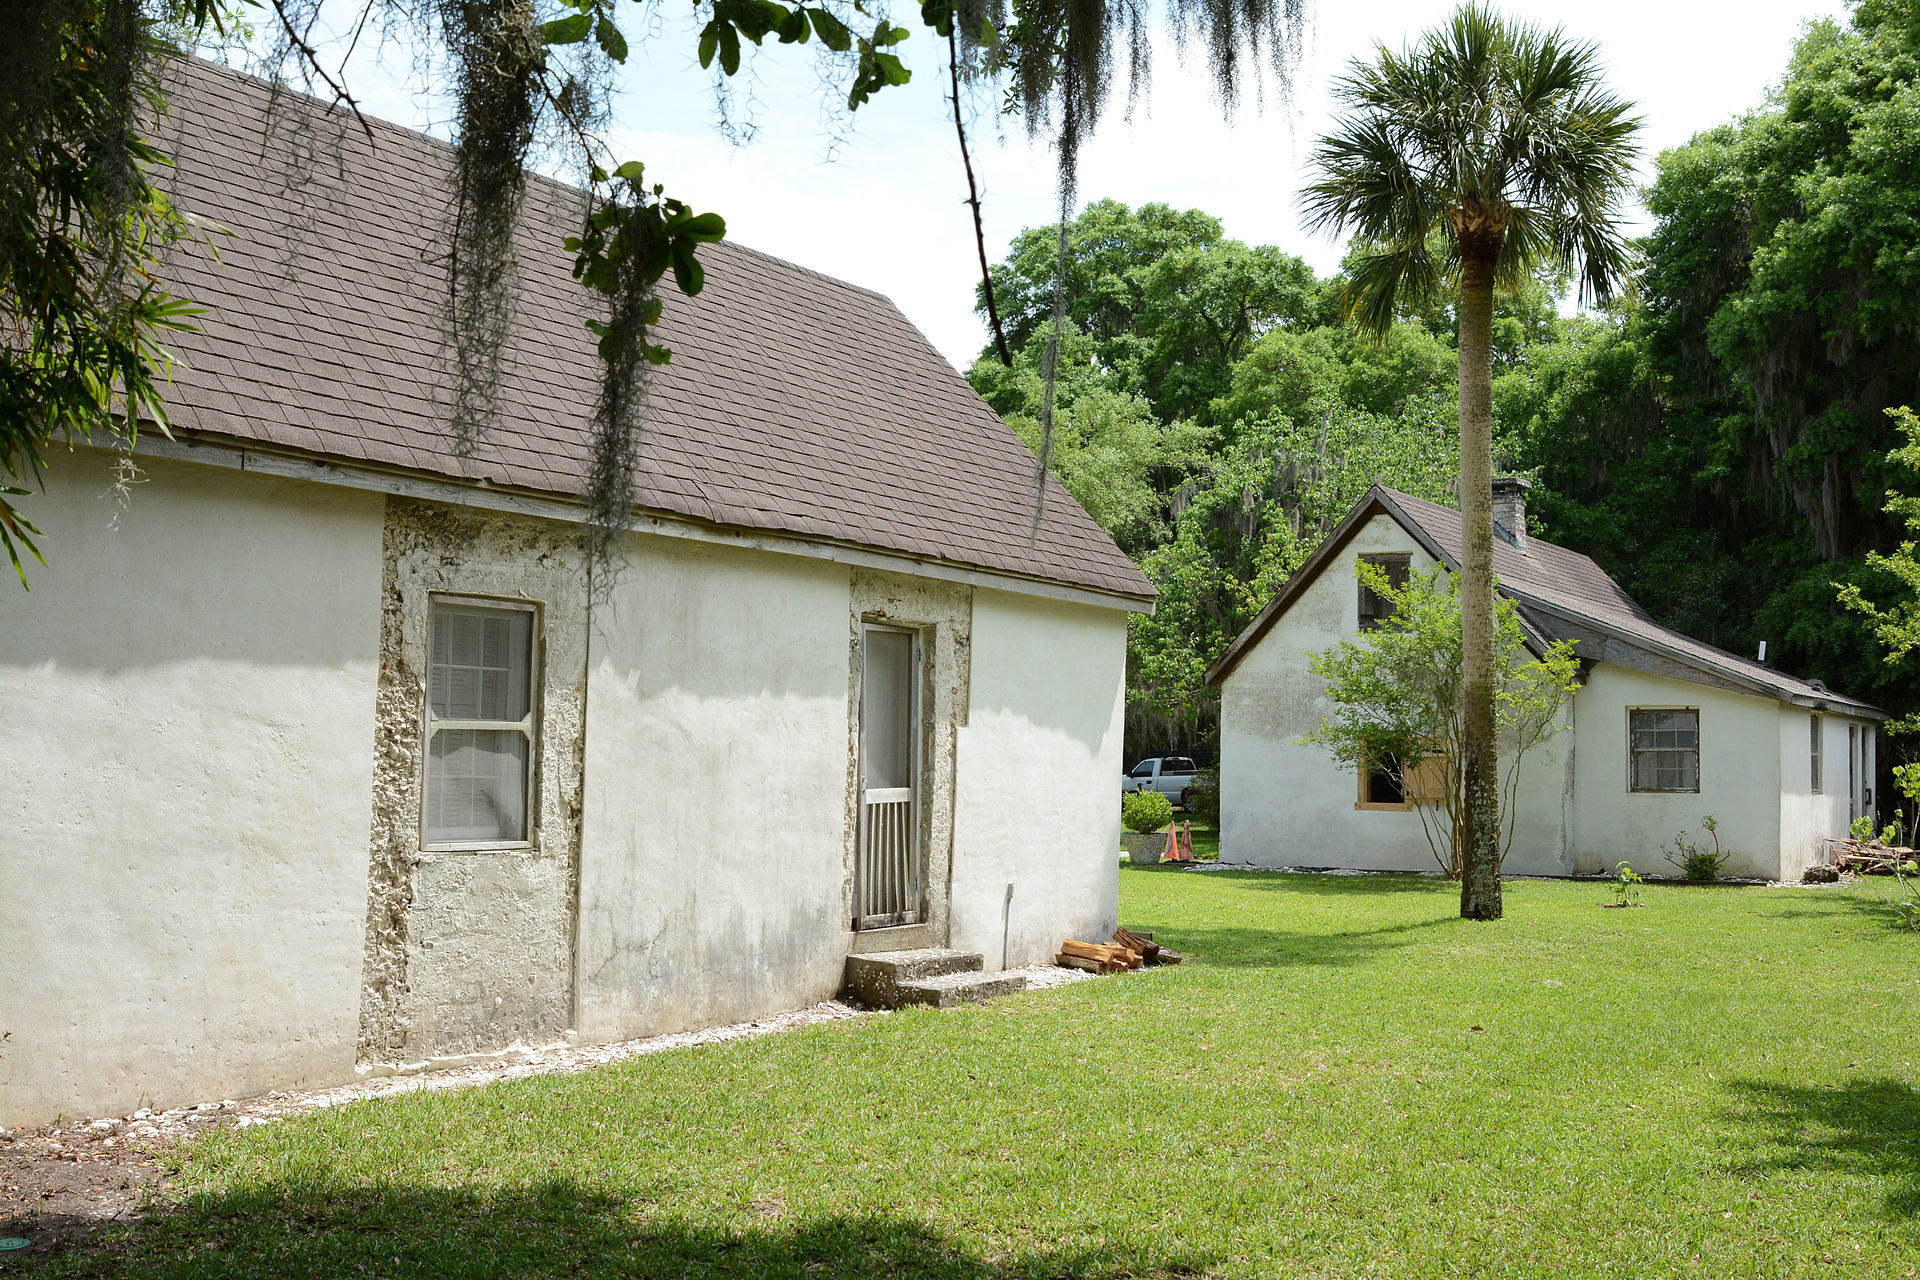 The Hamilton Plantation slave cabins